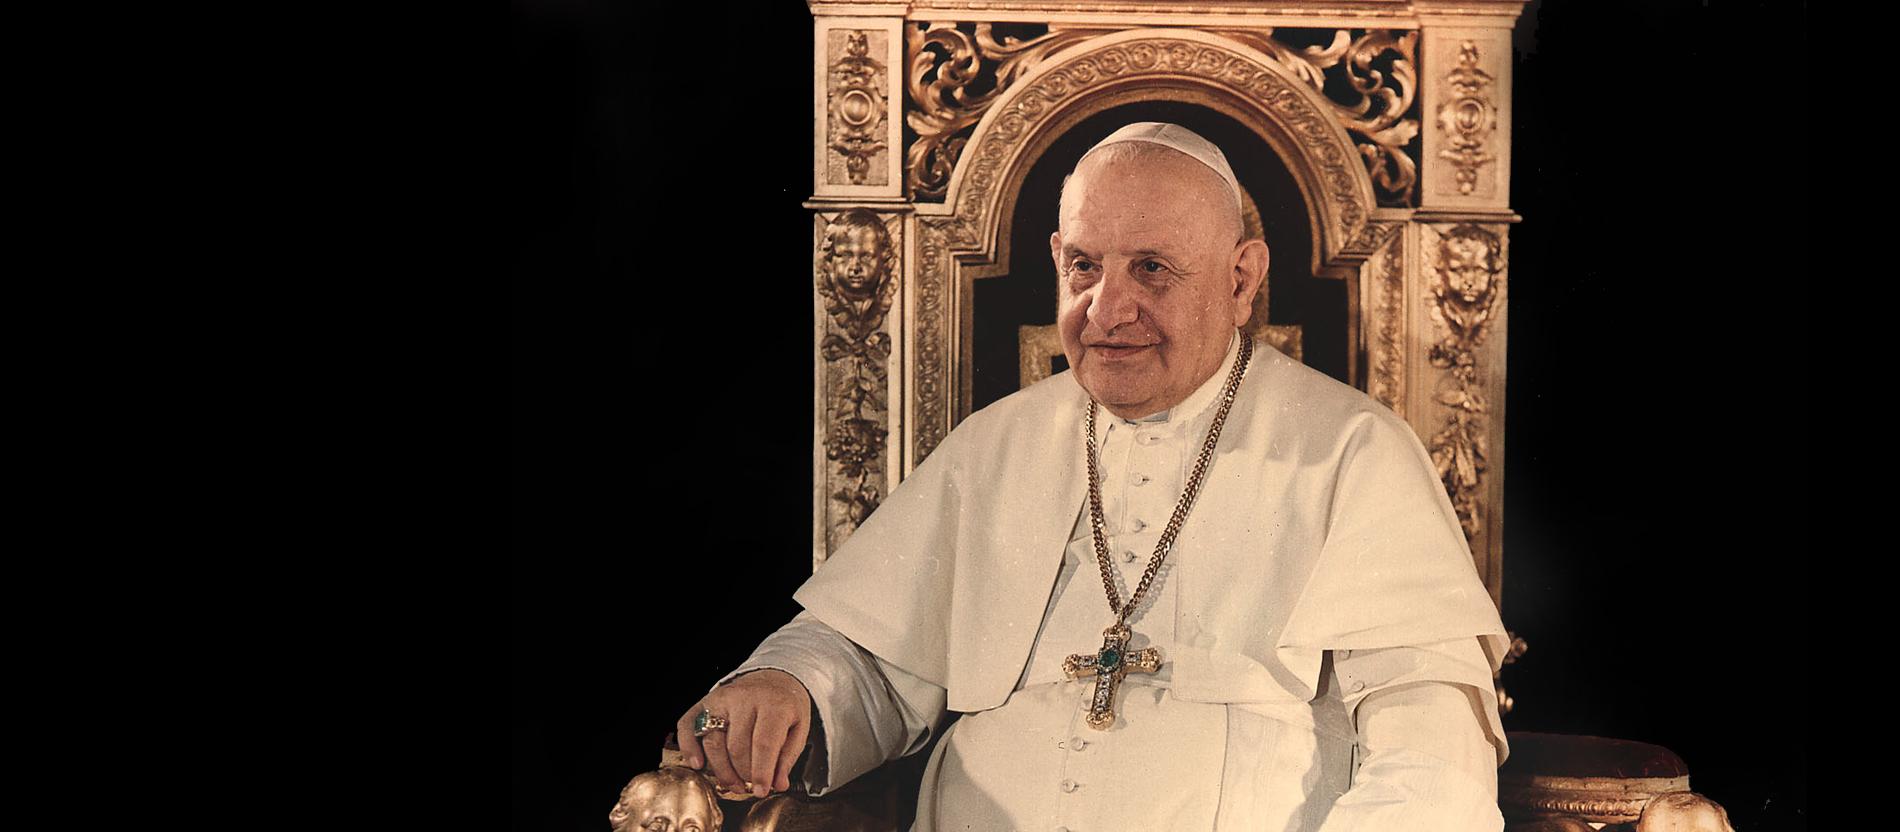 Johannes 23 Papst